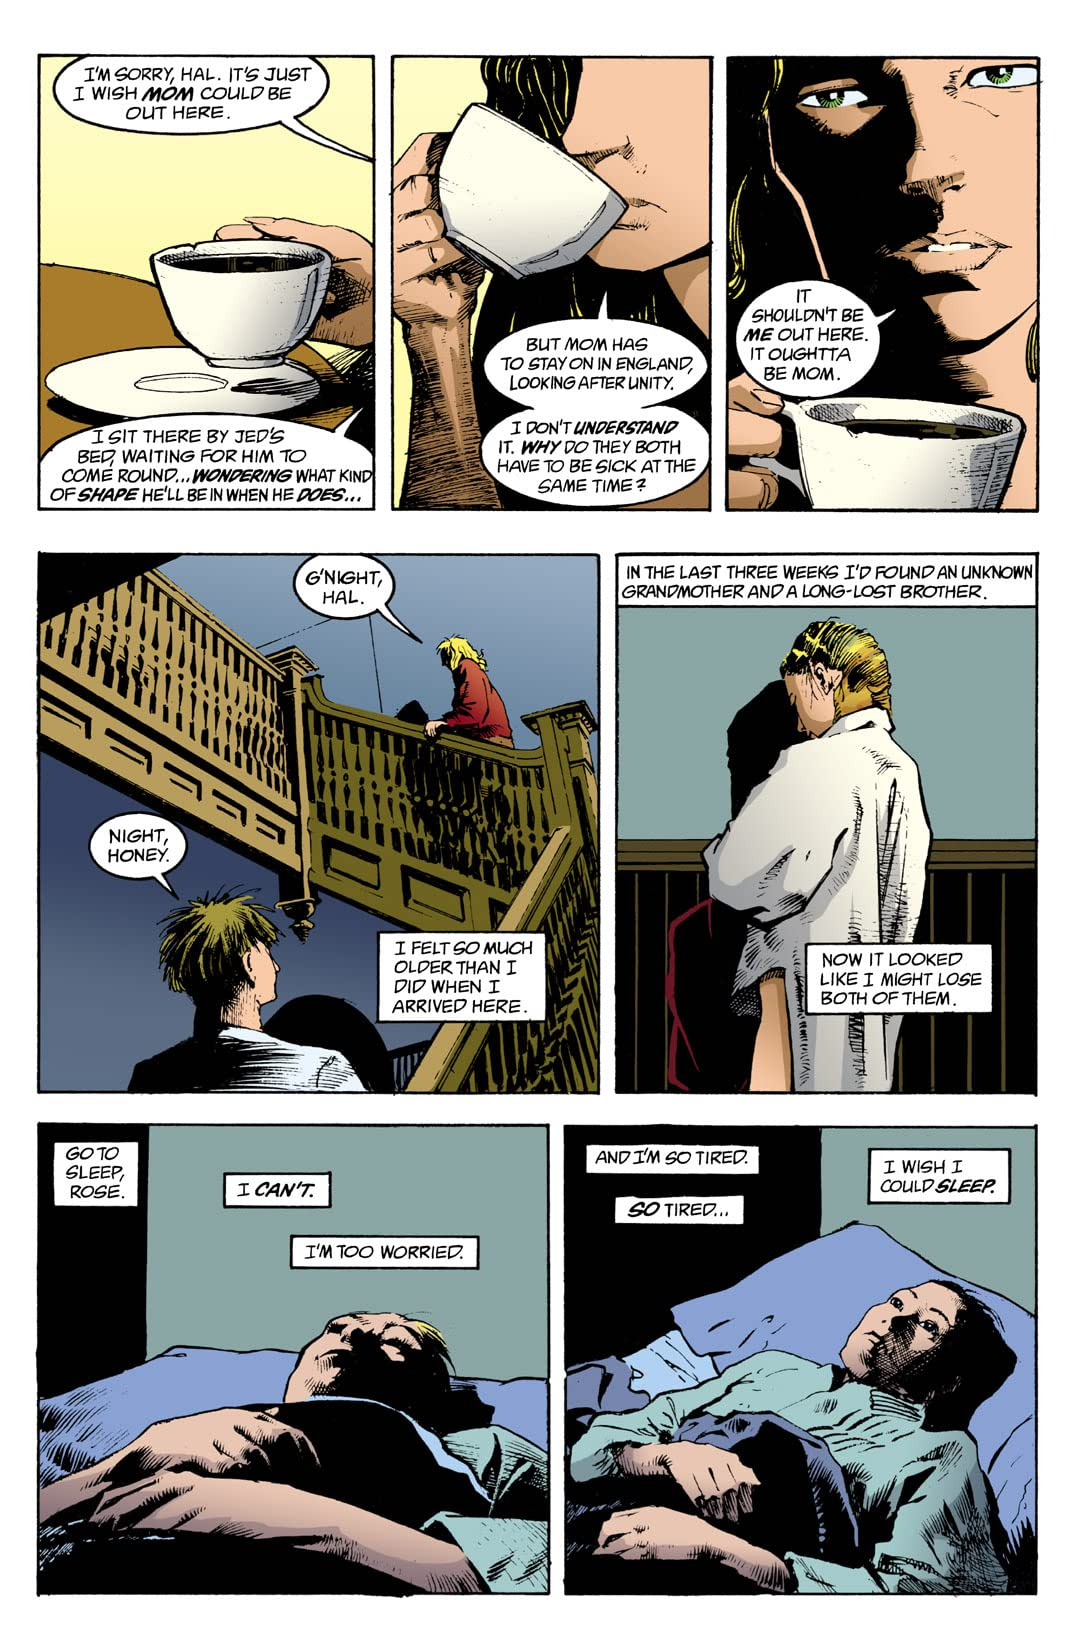 The Sandman #15